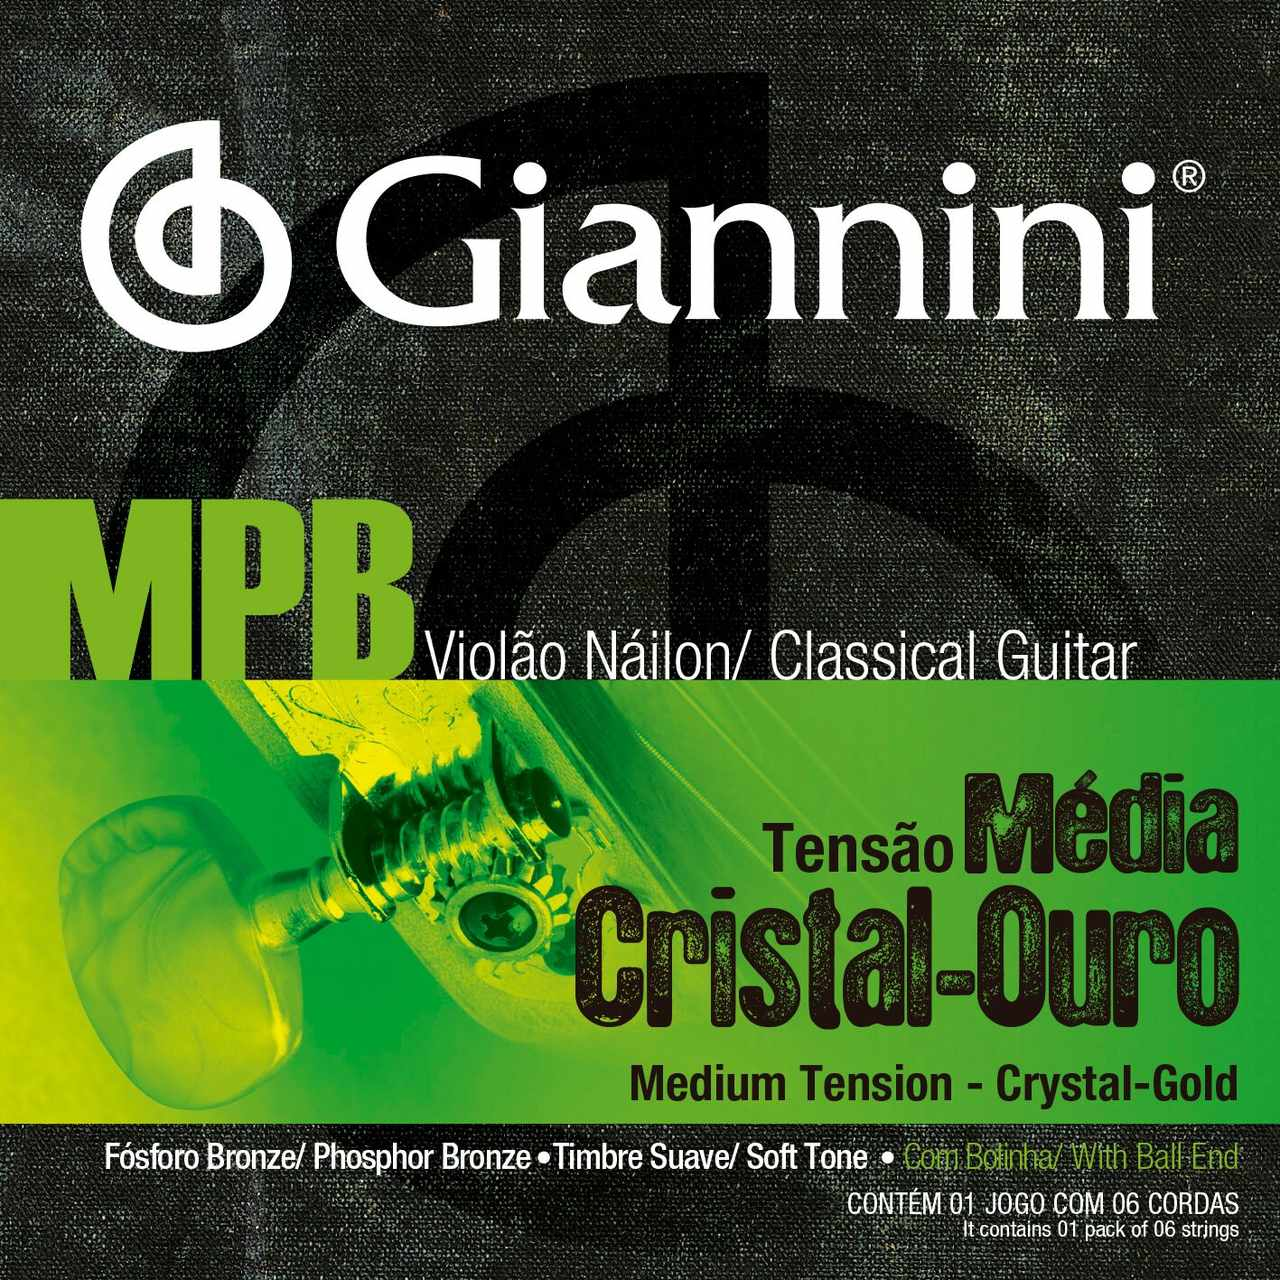 Encordoamento p/Violão Nylon Giannini Cristal/Ouro - GENWG